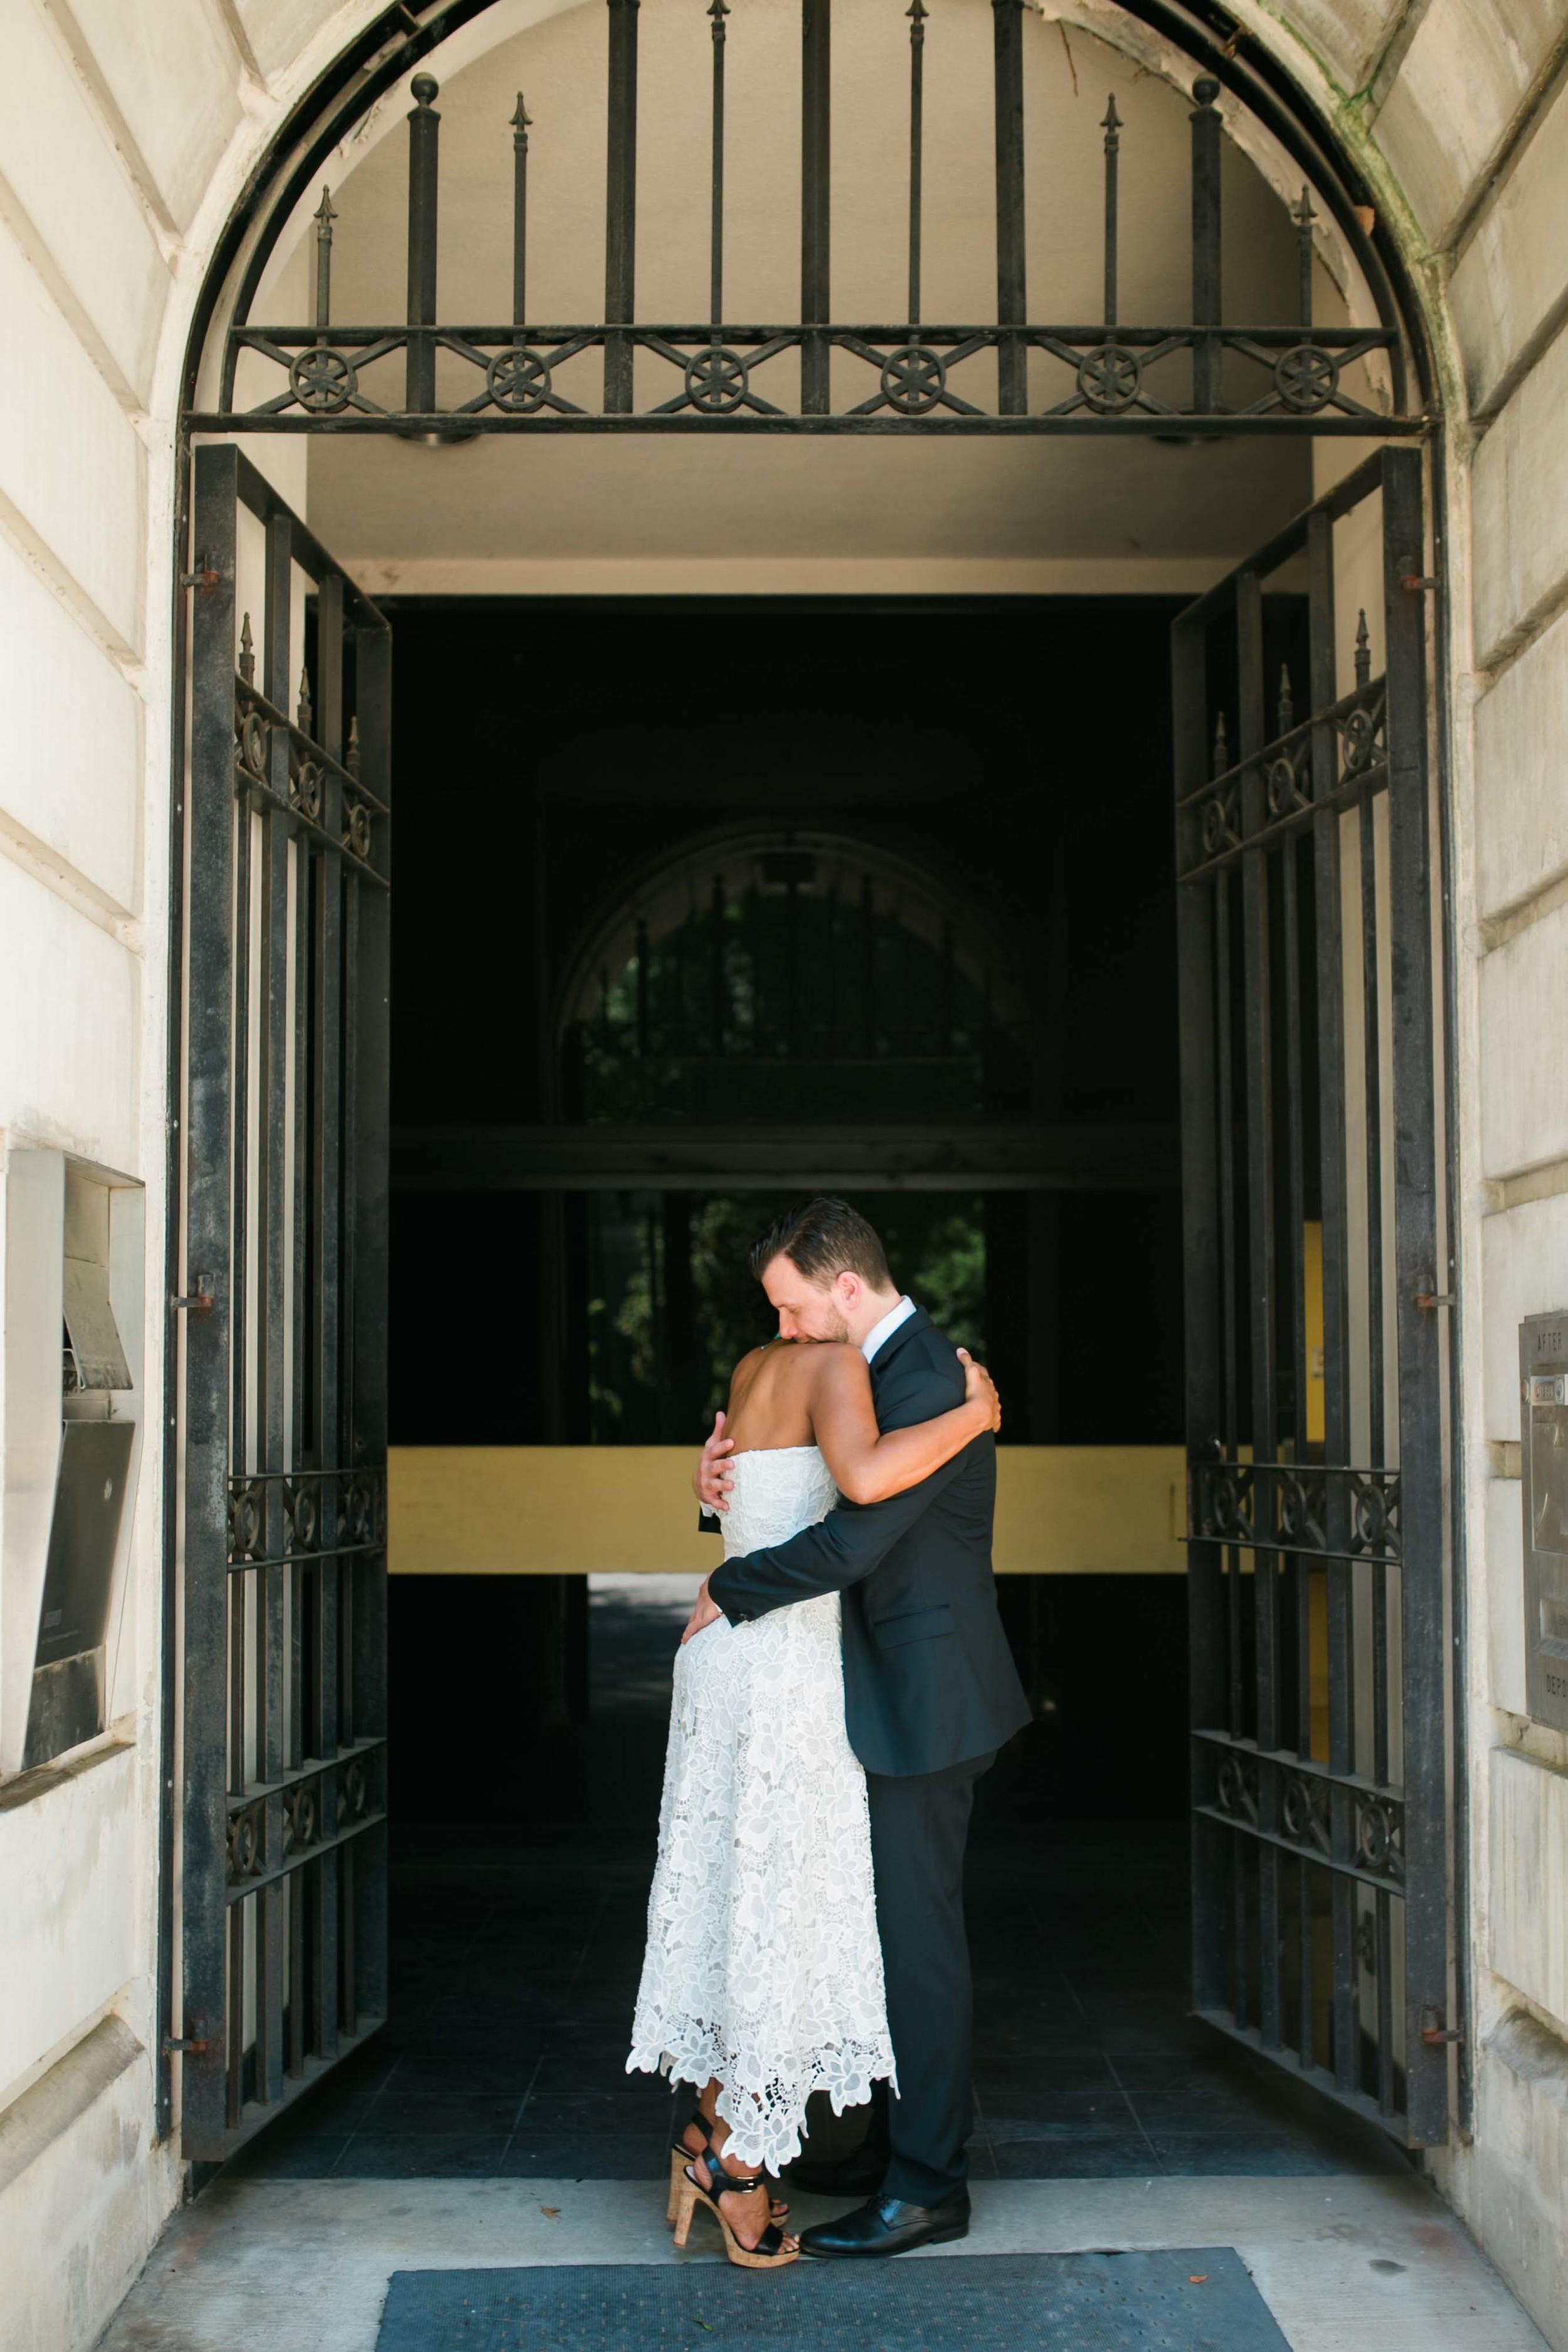 Dekalb-County-Courthouse-Wedding-Photos-Kiyah-C-Photography-64.jpg